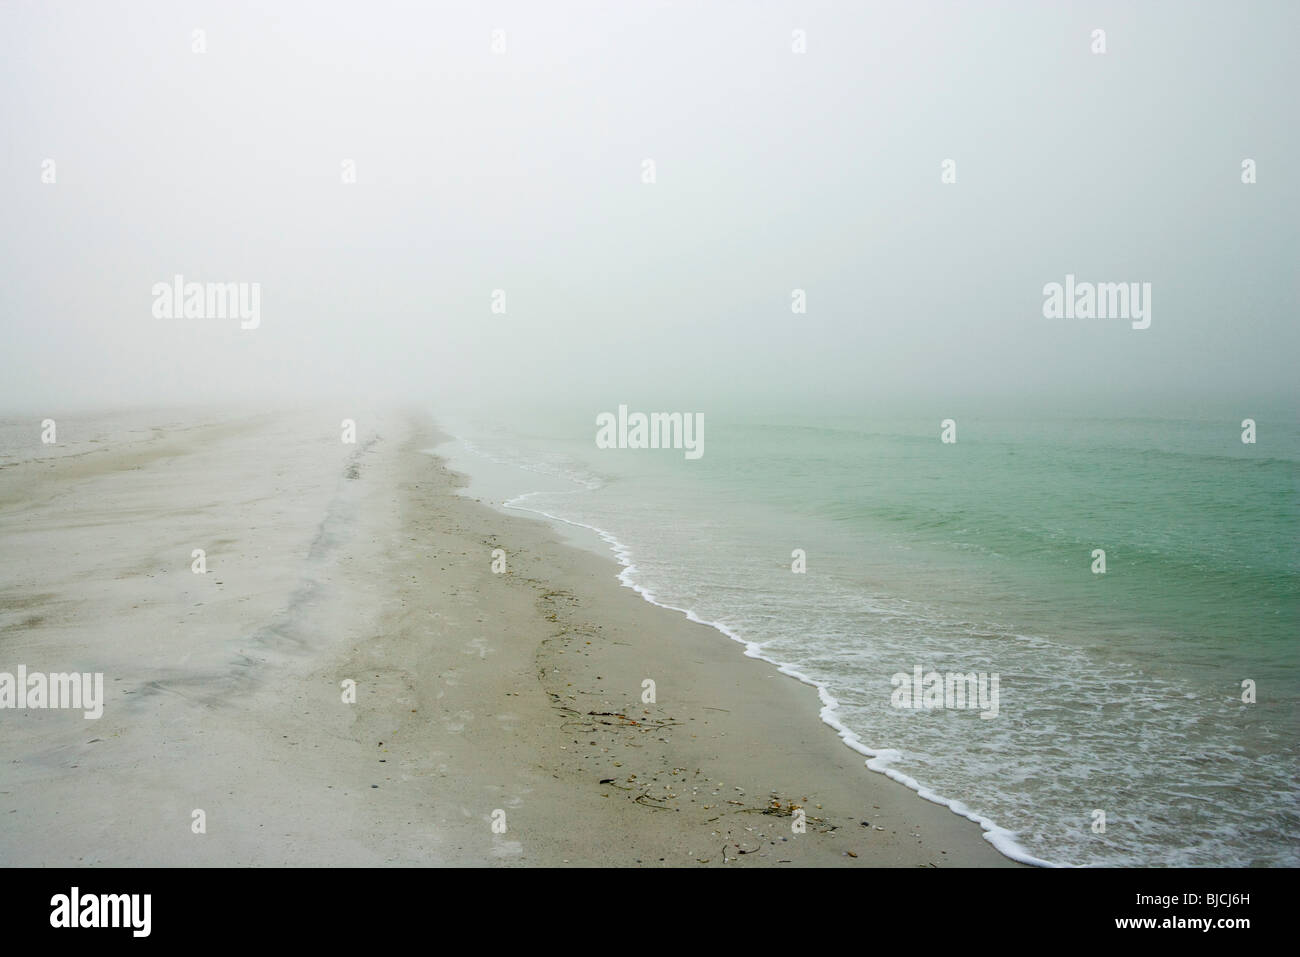 Plage couverte de brouillard Photo Stock